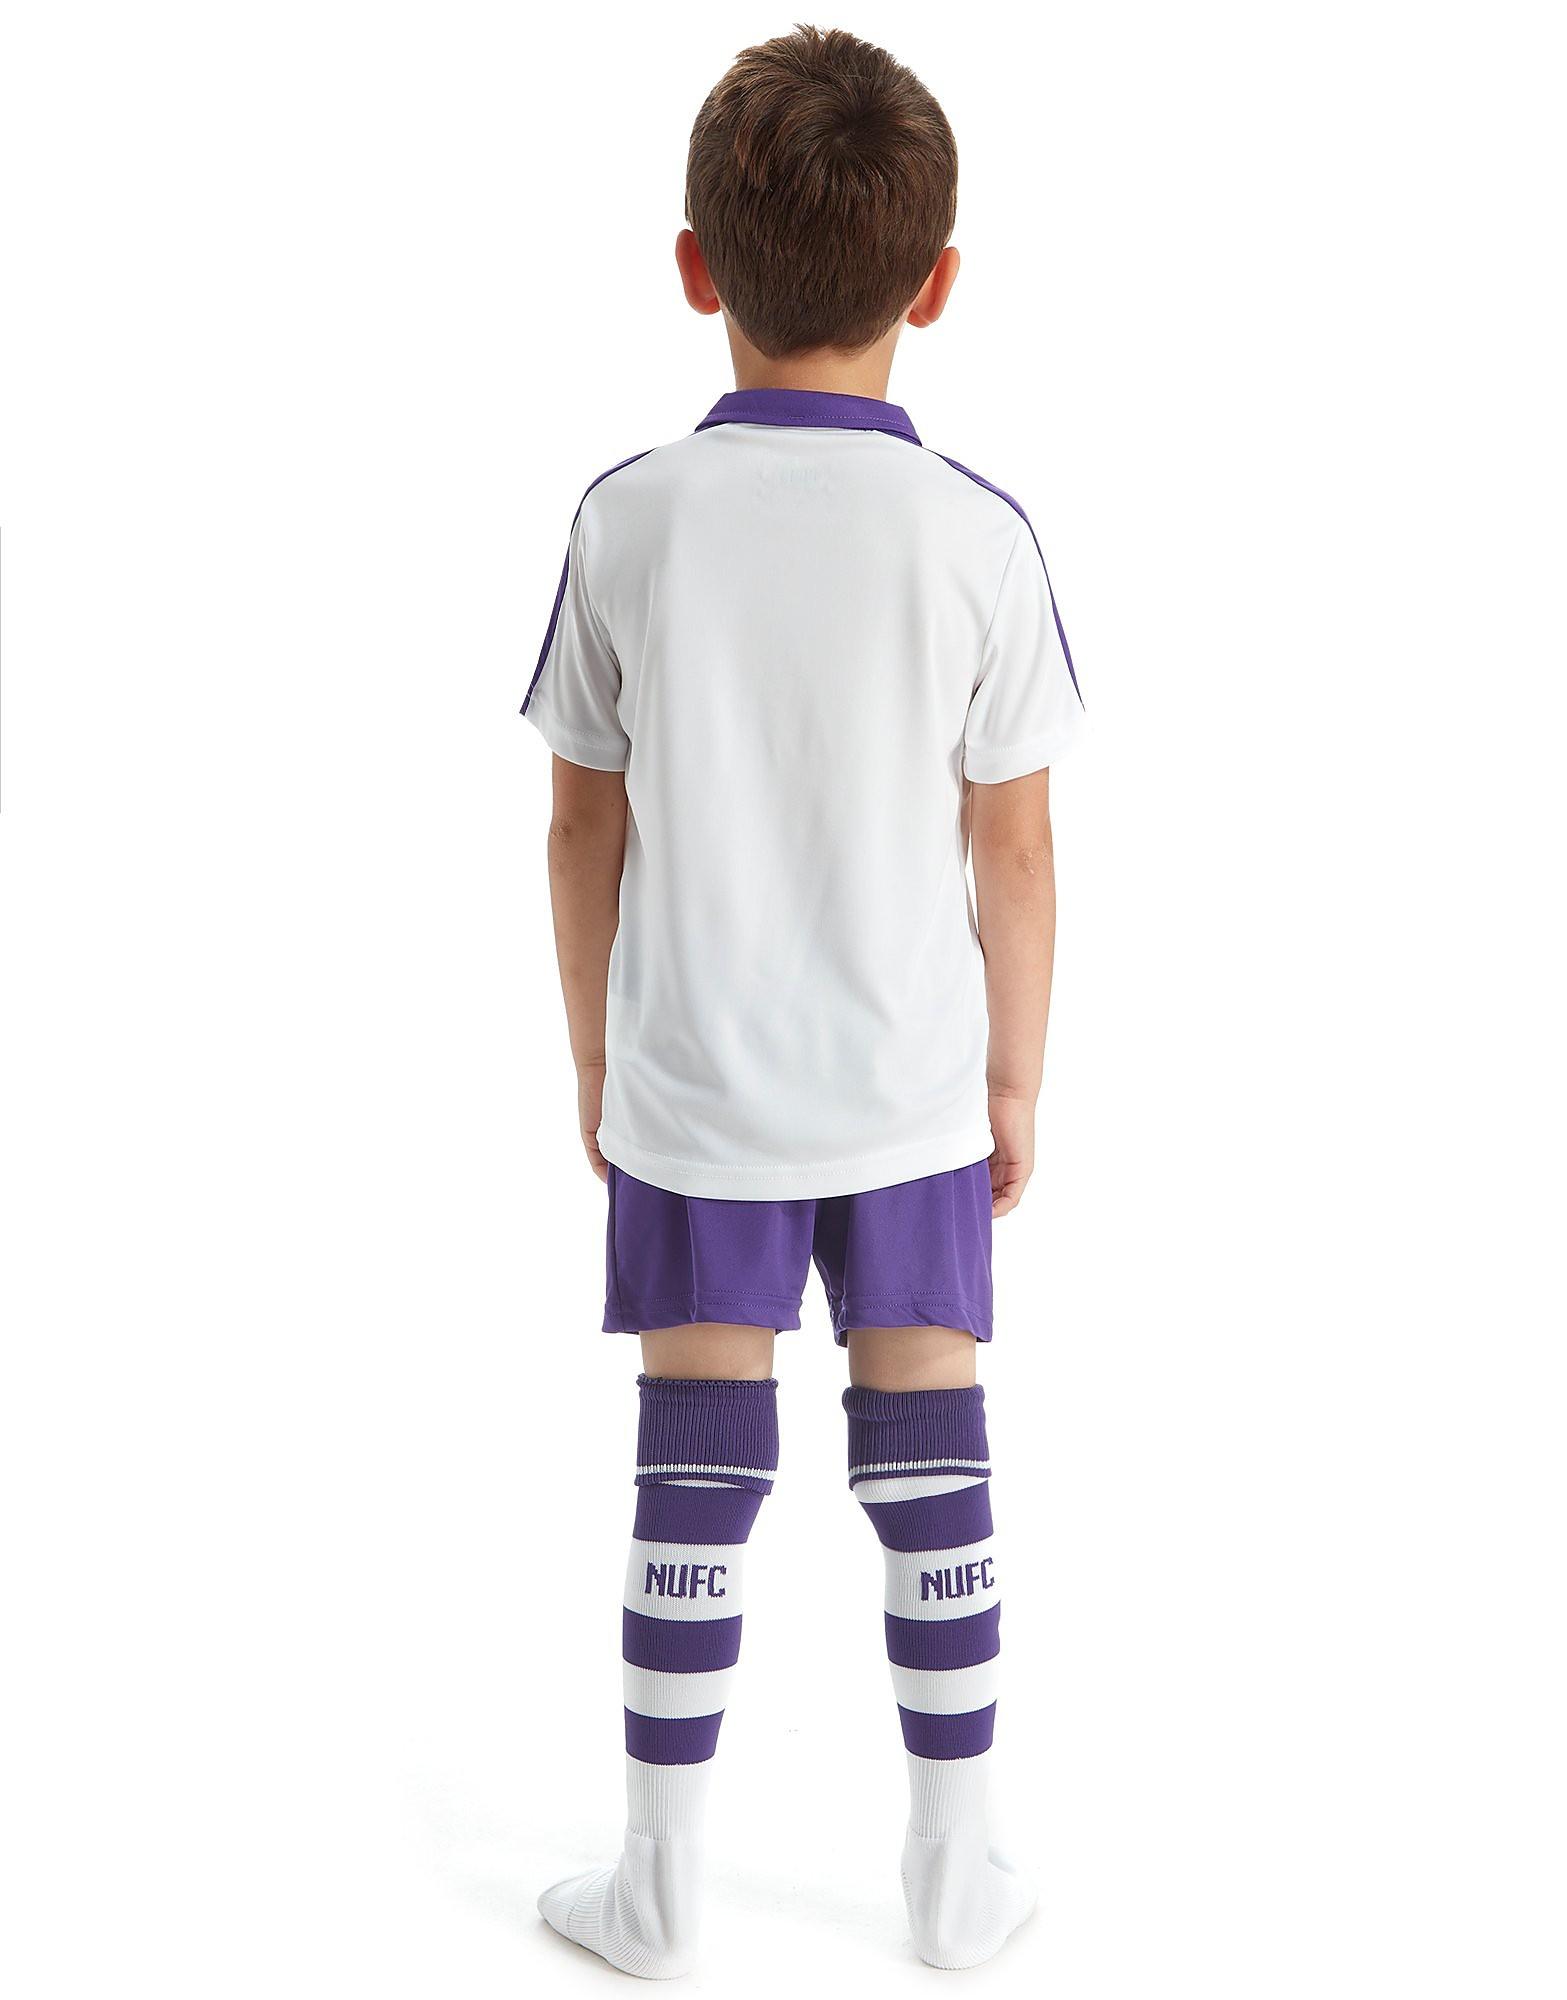 PUMA Newcastle United 2016/17 Third Kit Children